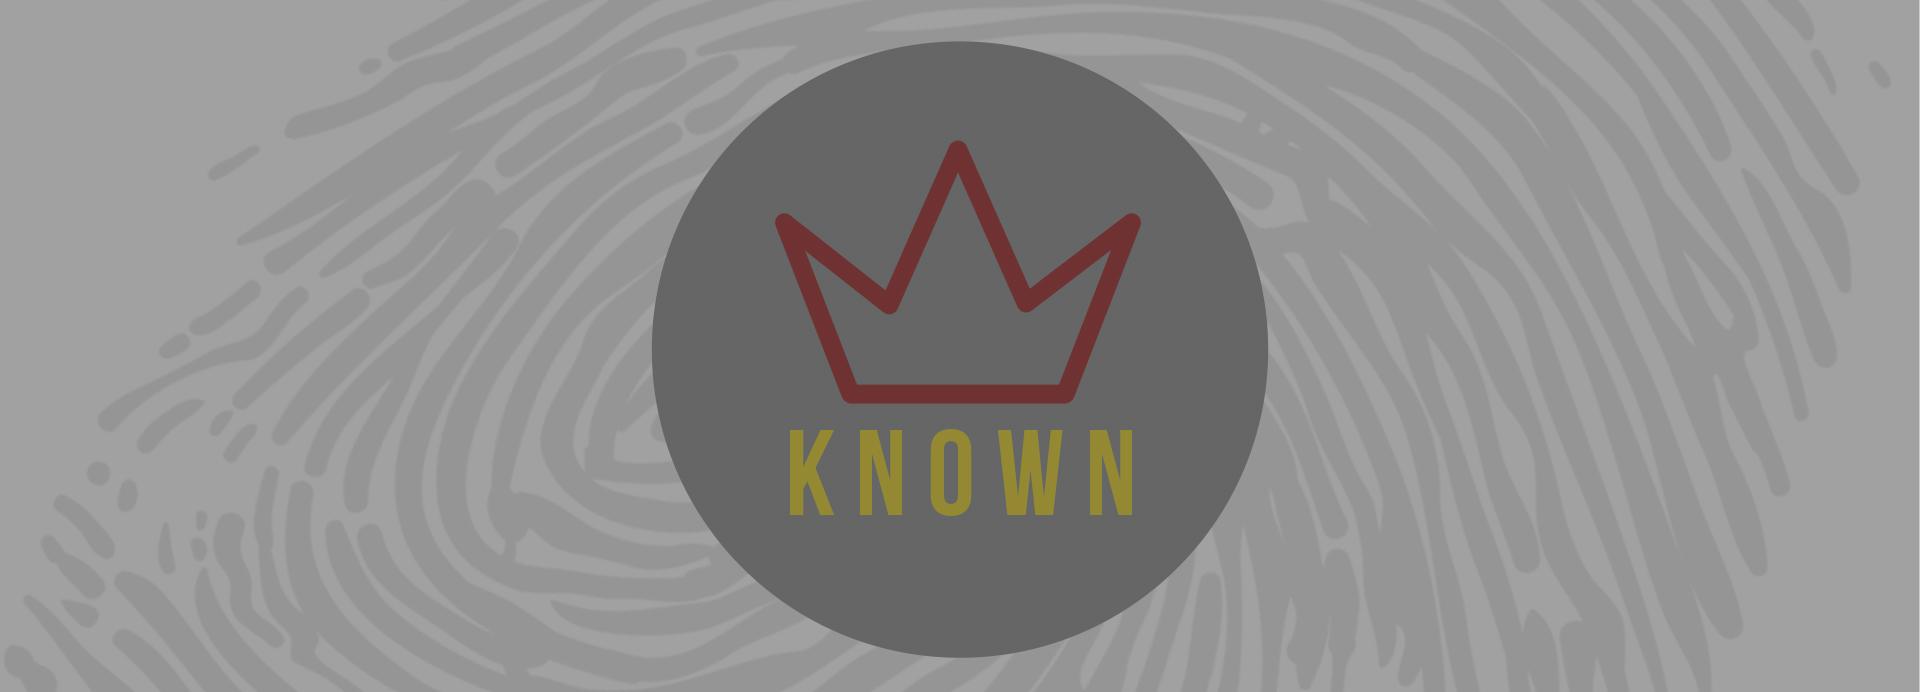 KNOWN Fall 2019 Series App Banner.jpg